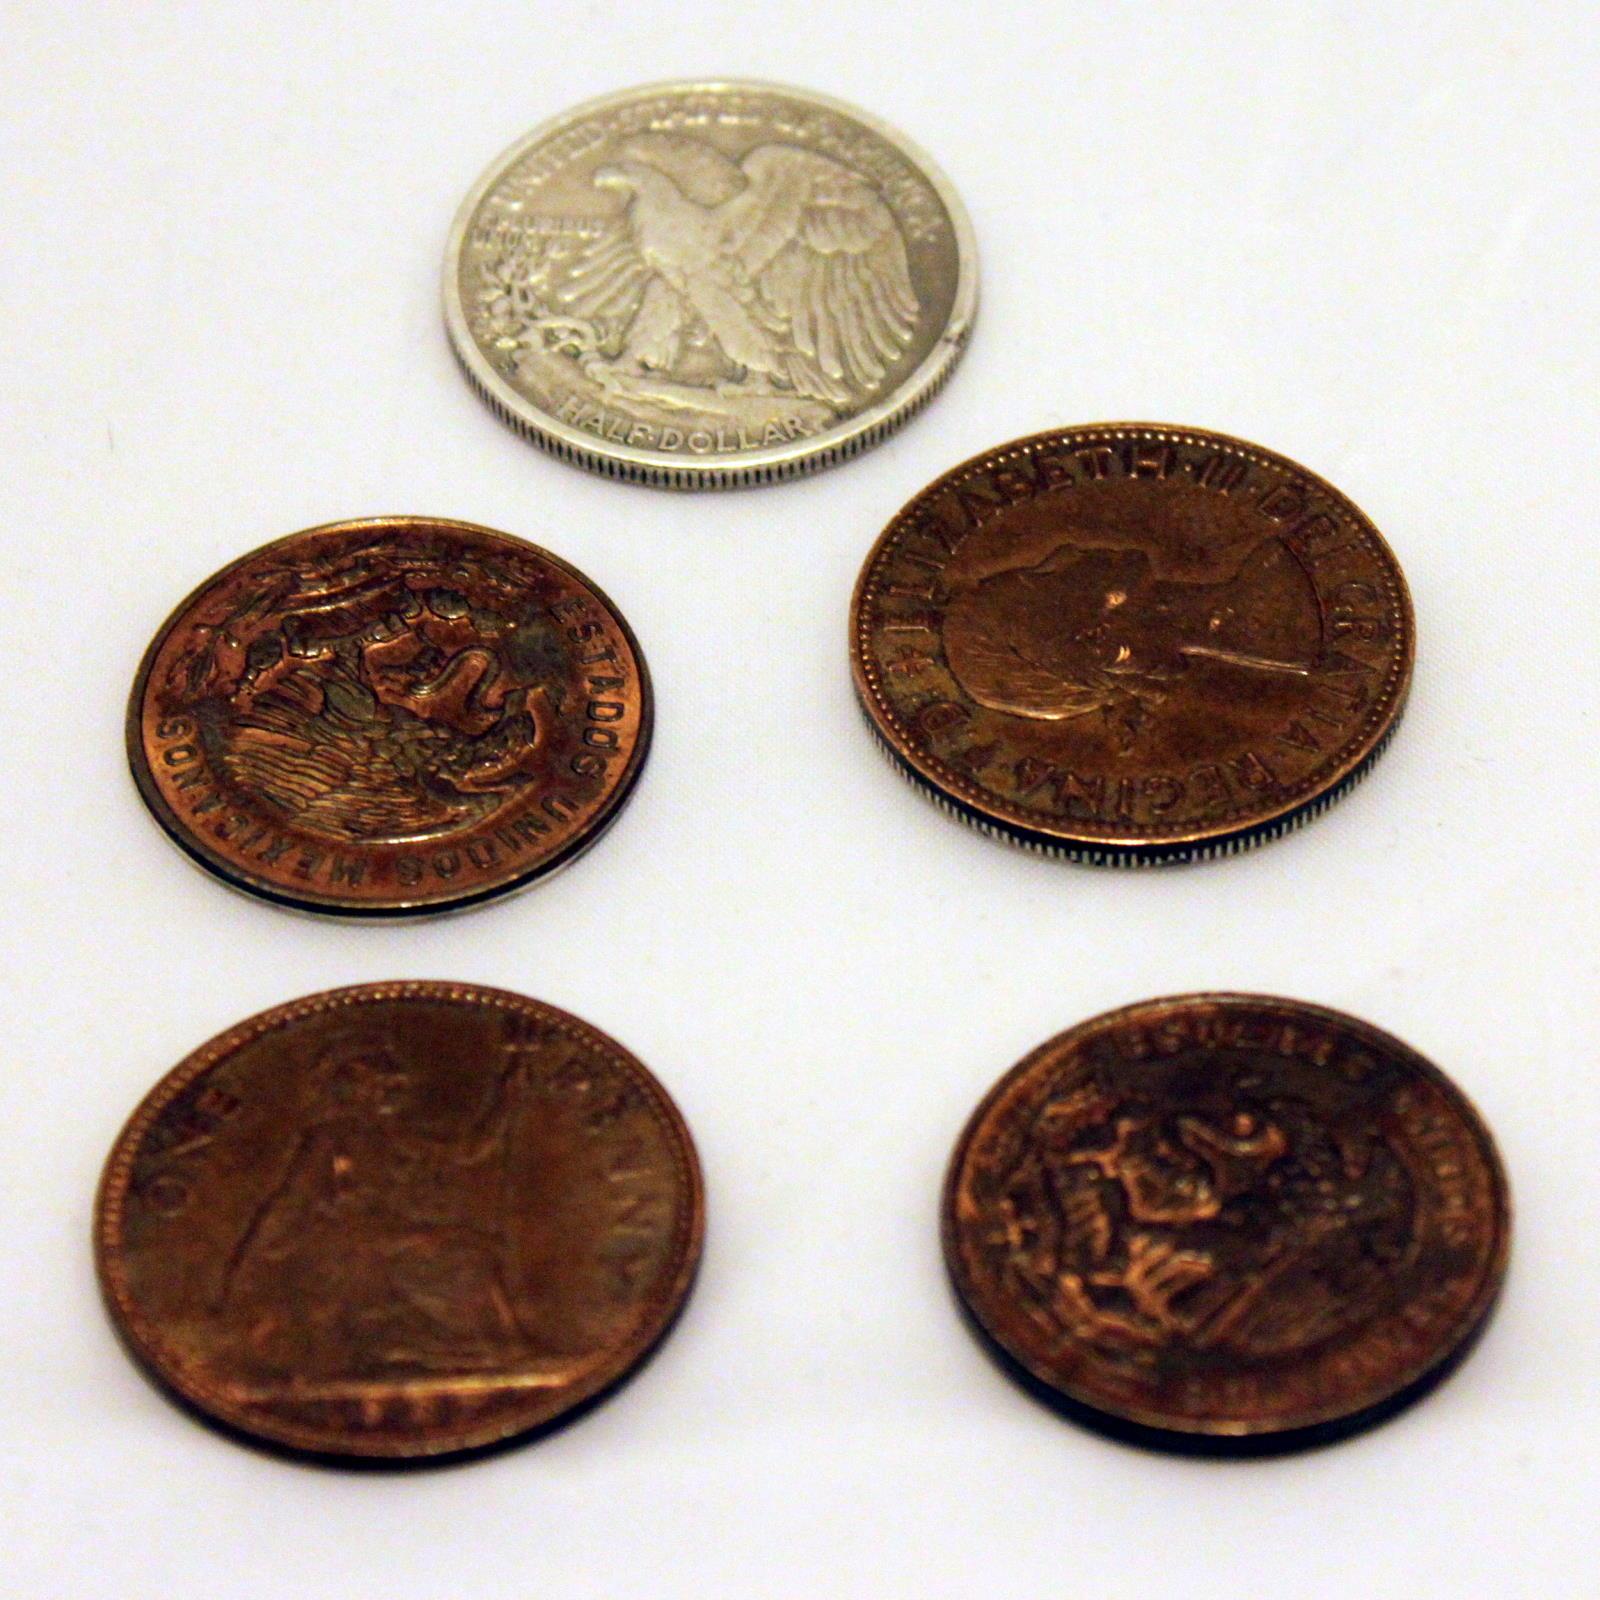 Two Copper One Silver (Schoolcraft) by Jamie Schoolcraft